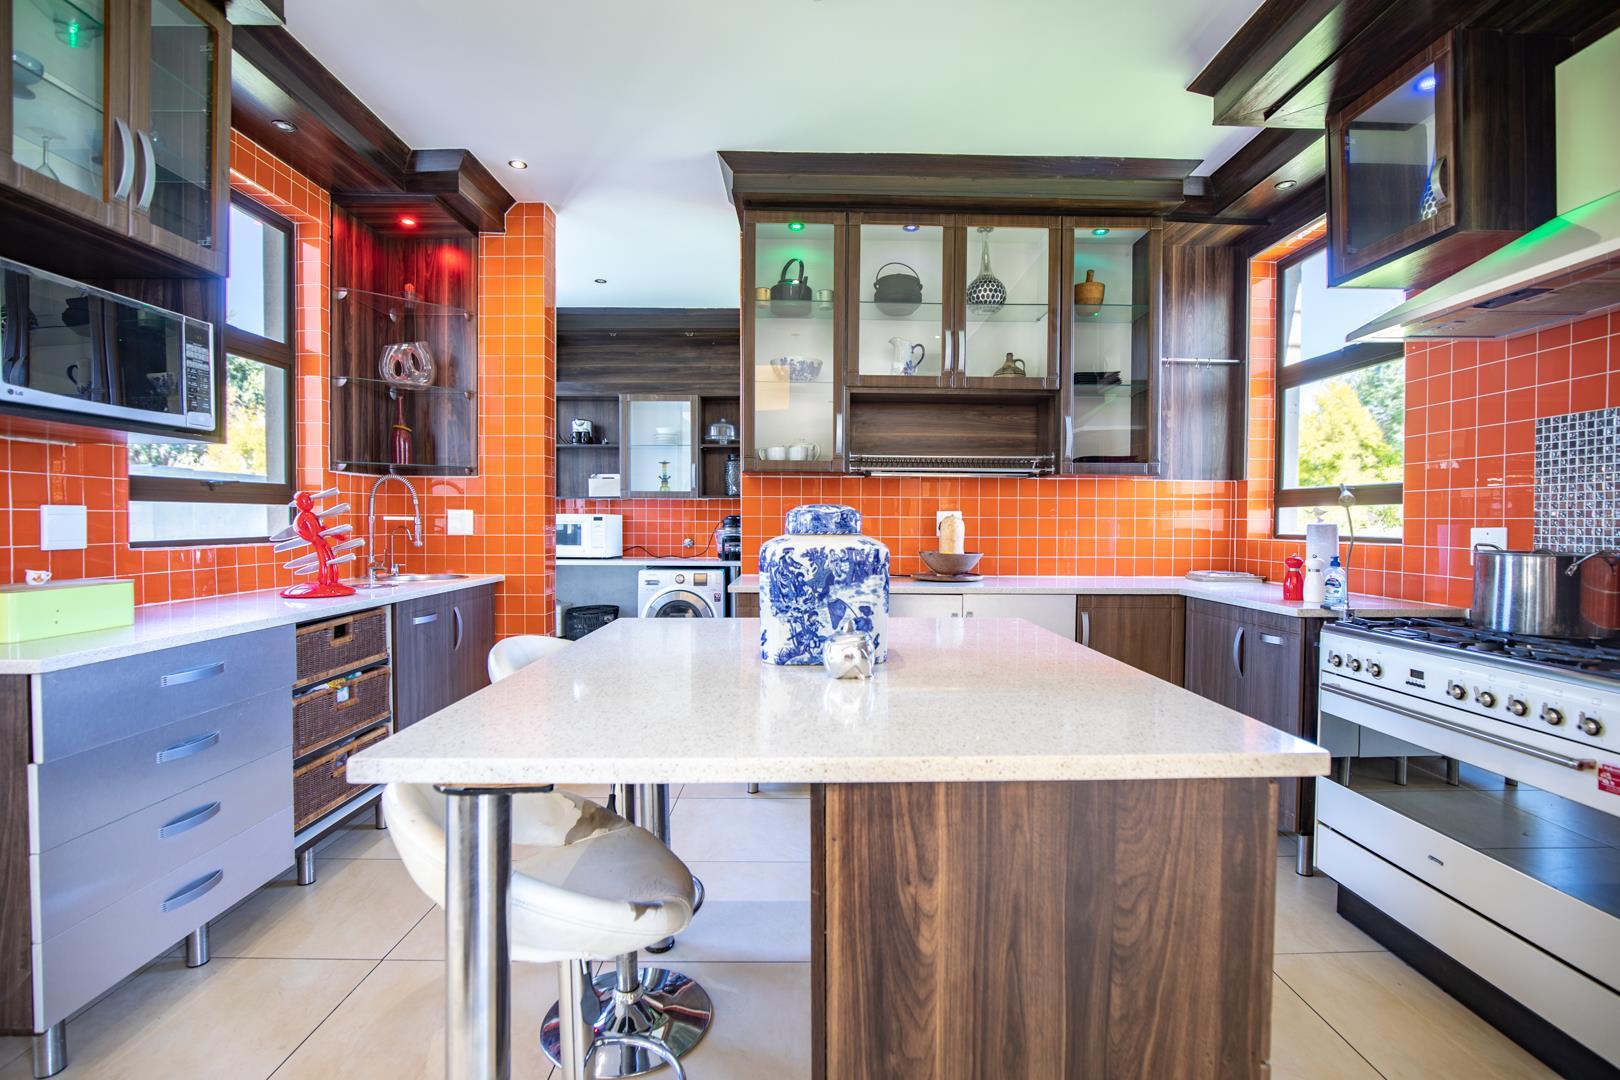 5 Bedroom House For Sale in Verresig Country Estate